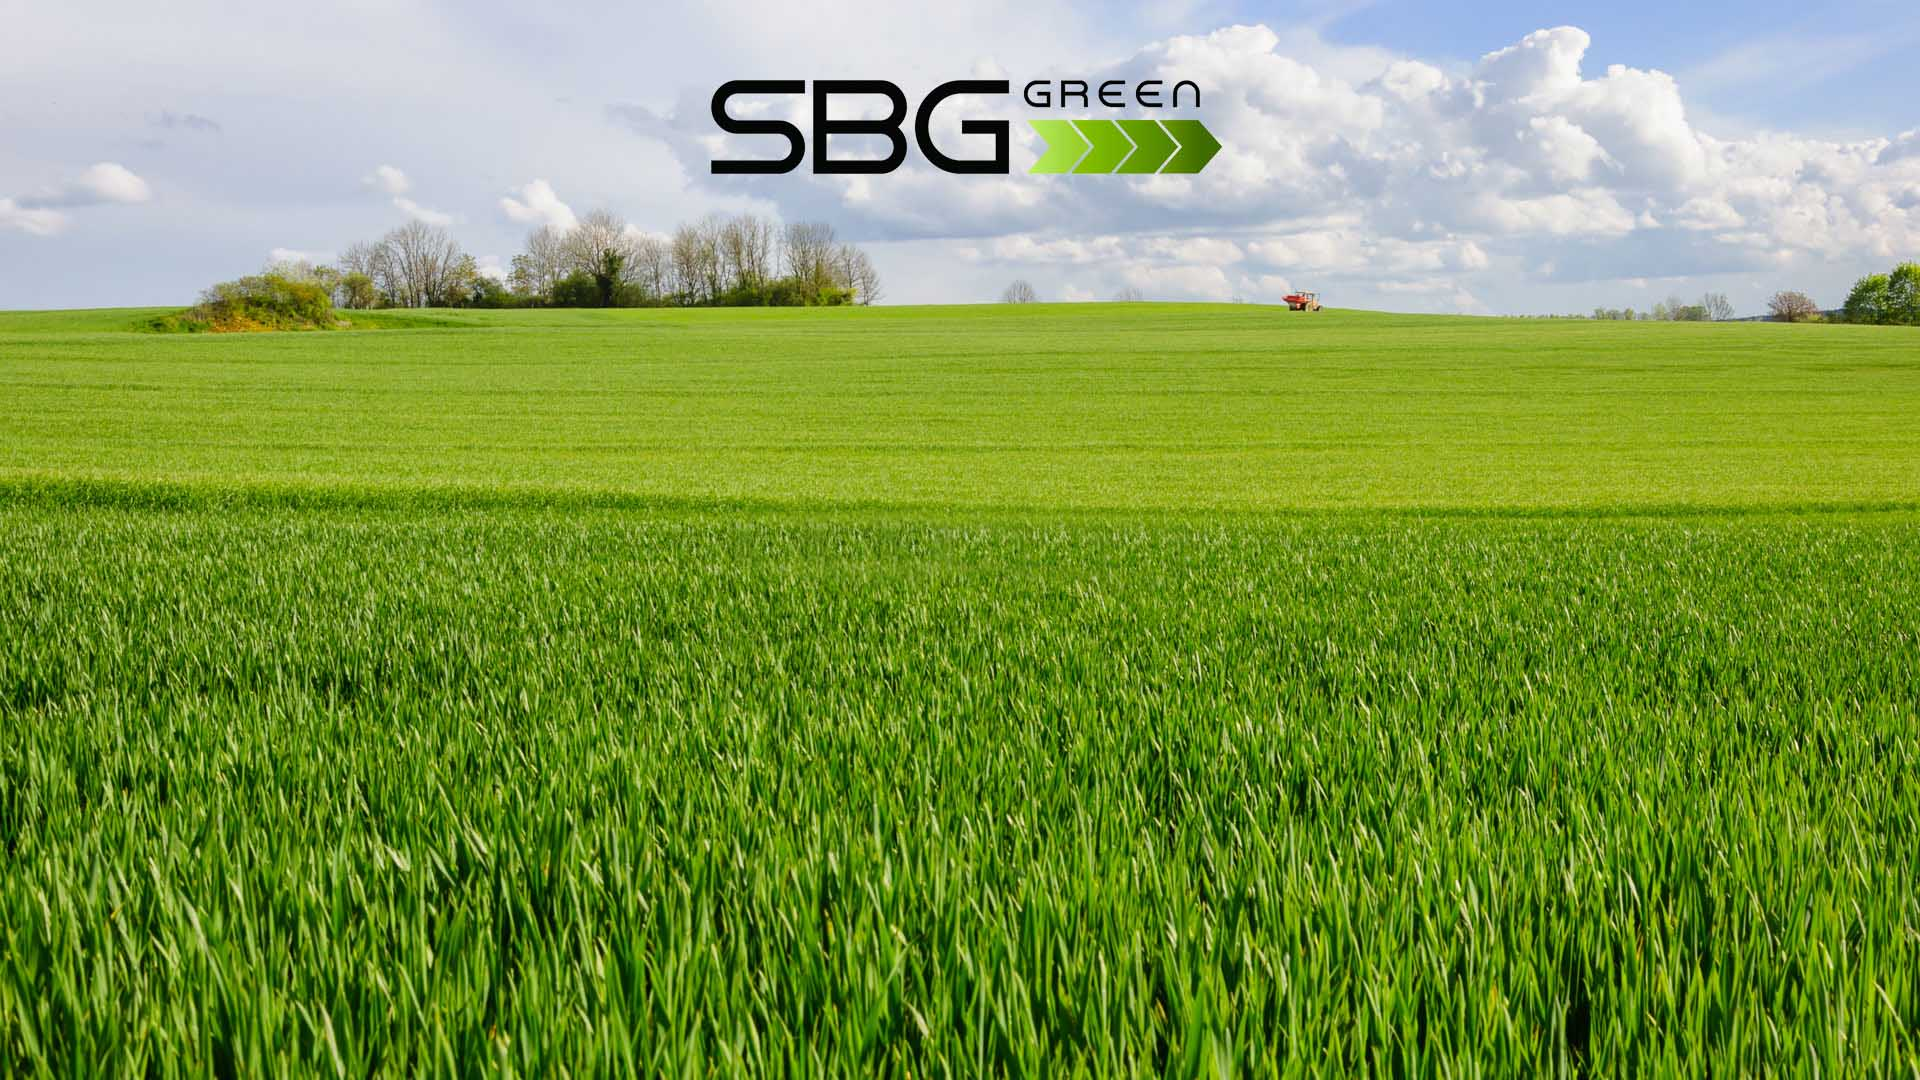 sbg green def copia - Green